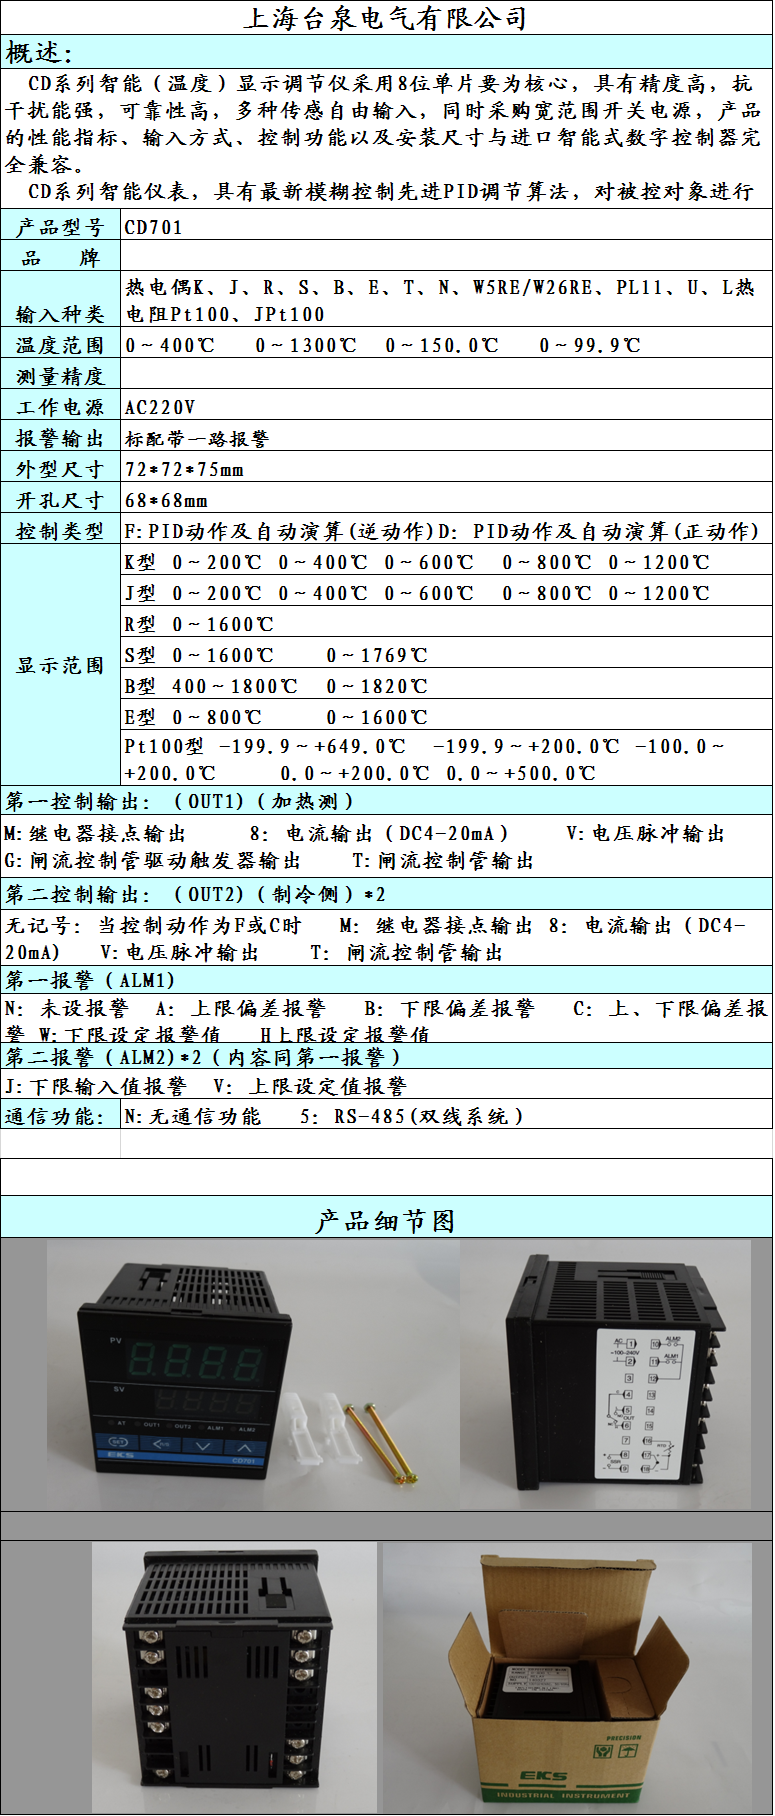 cd系列智能(温度)显示调节仪采用8位单片